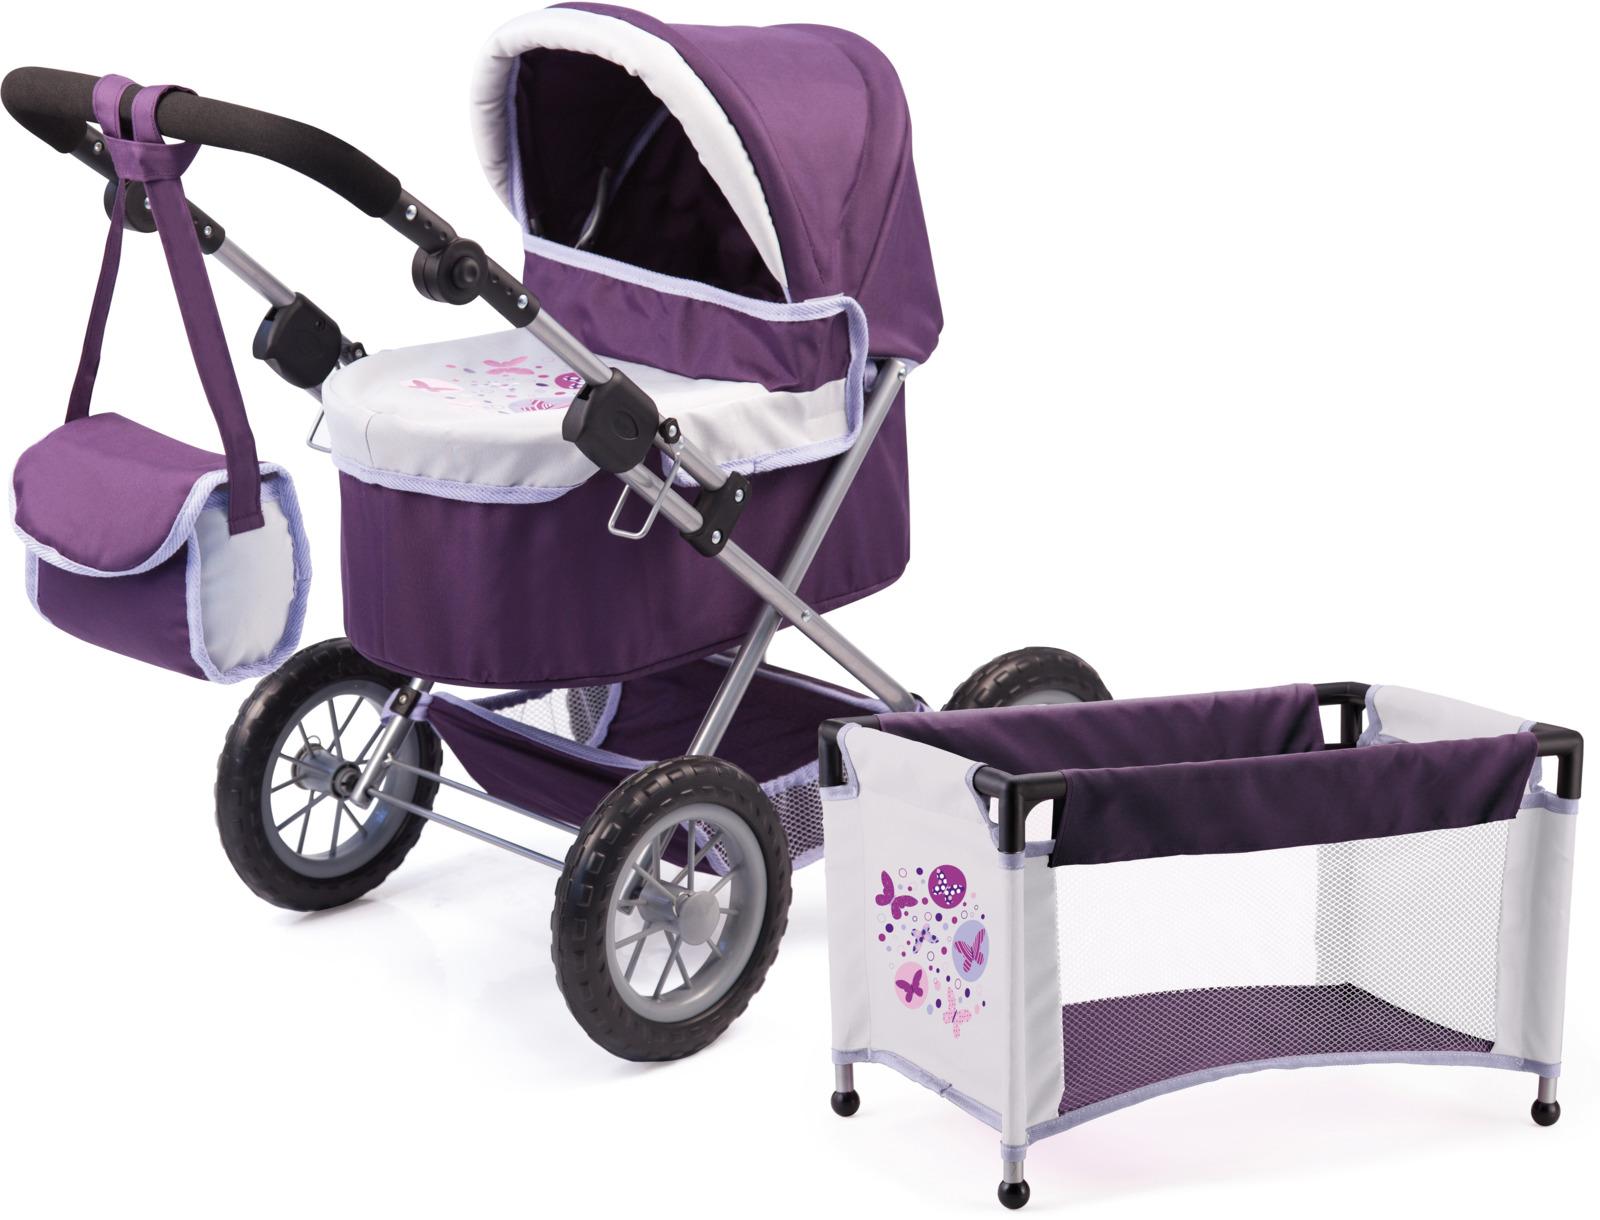 Bayer Мебель для кукол Тренди коляска для кукол bayer design тренди цвет серый розовый